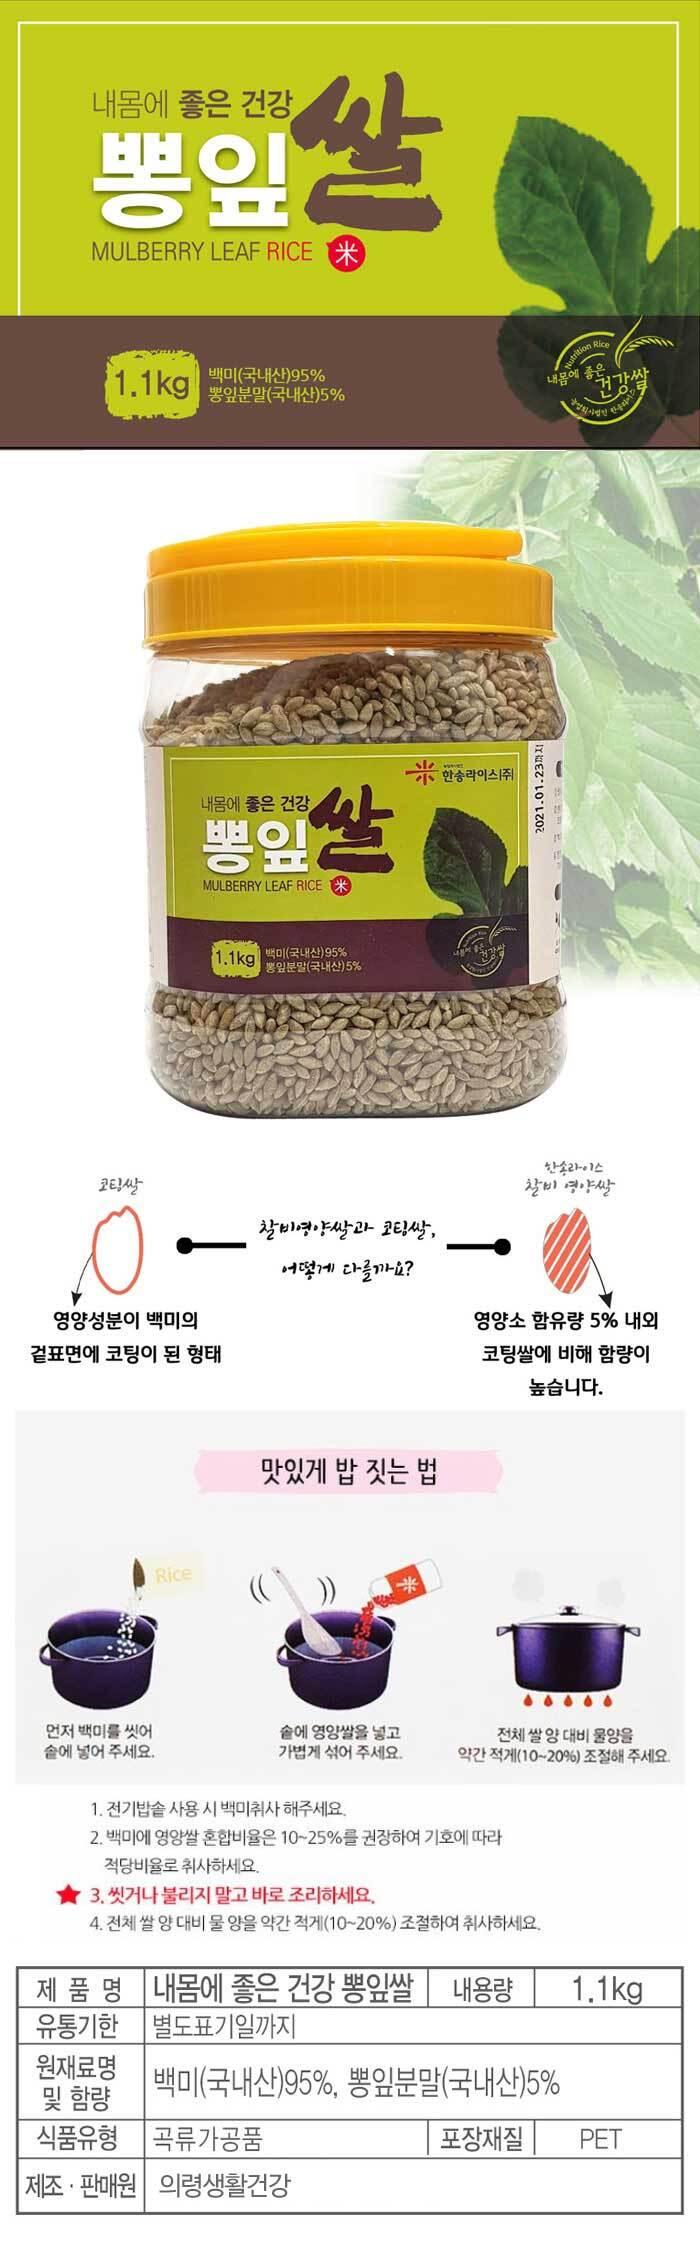 HanSong-rice1100g-mulberryleaf.jpg